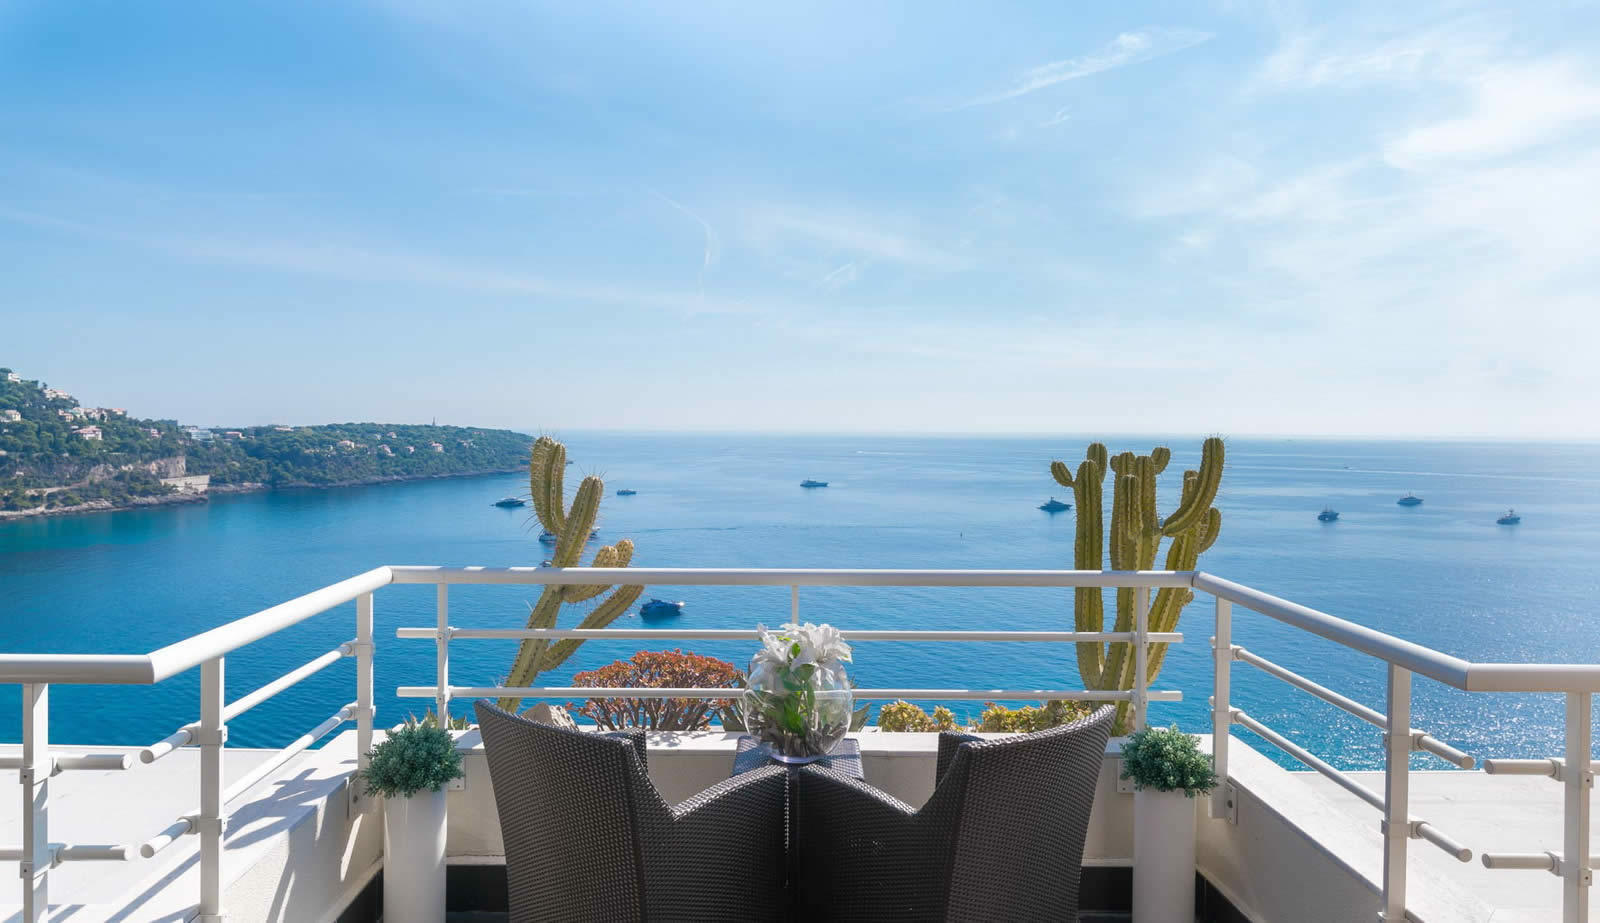 Duplex avec vue mer et sur le Cap Martin  vendre  RoquebruneCapMartin